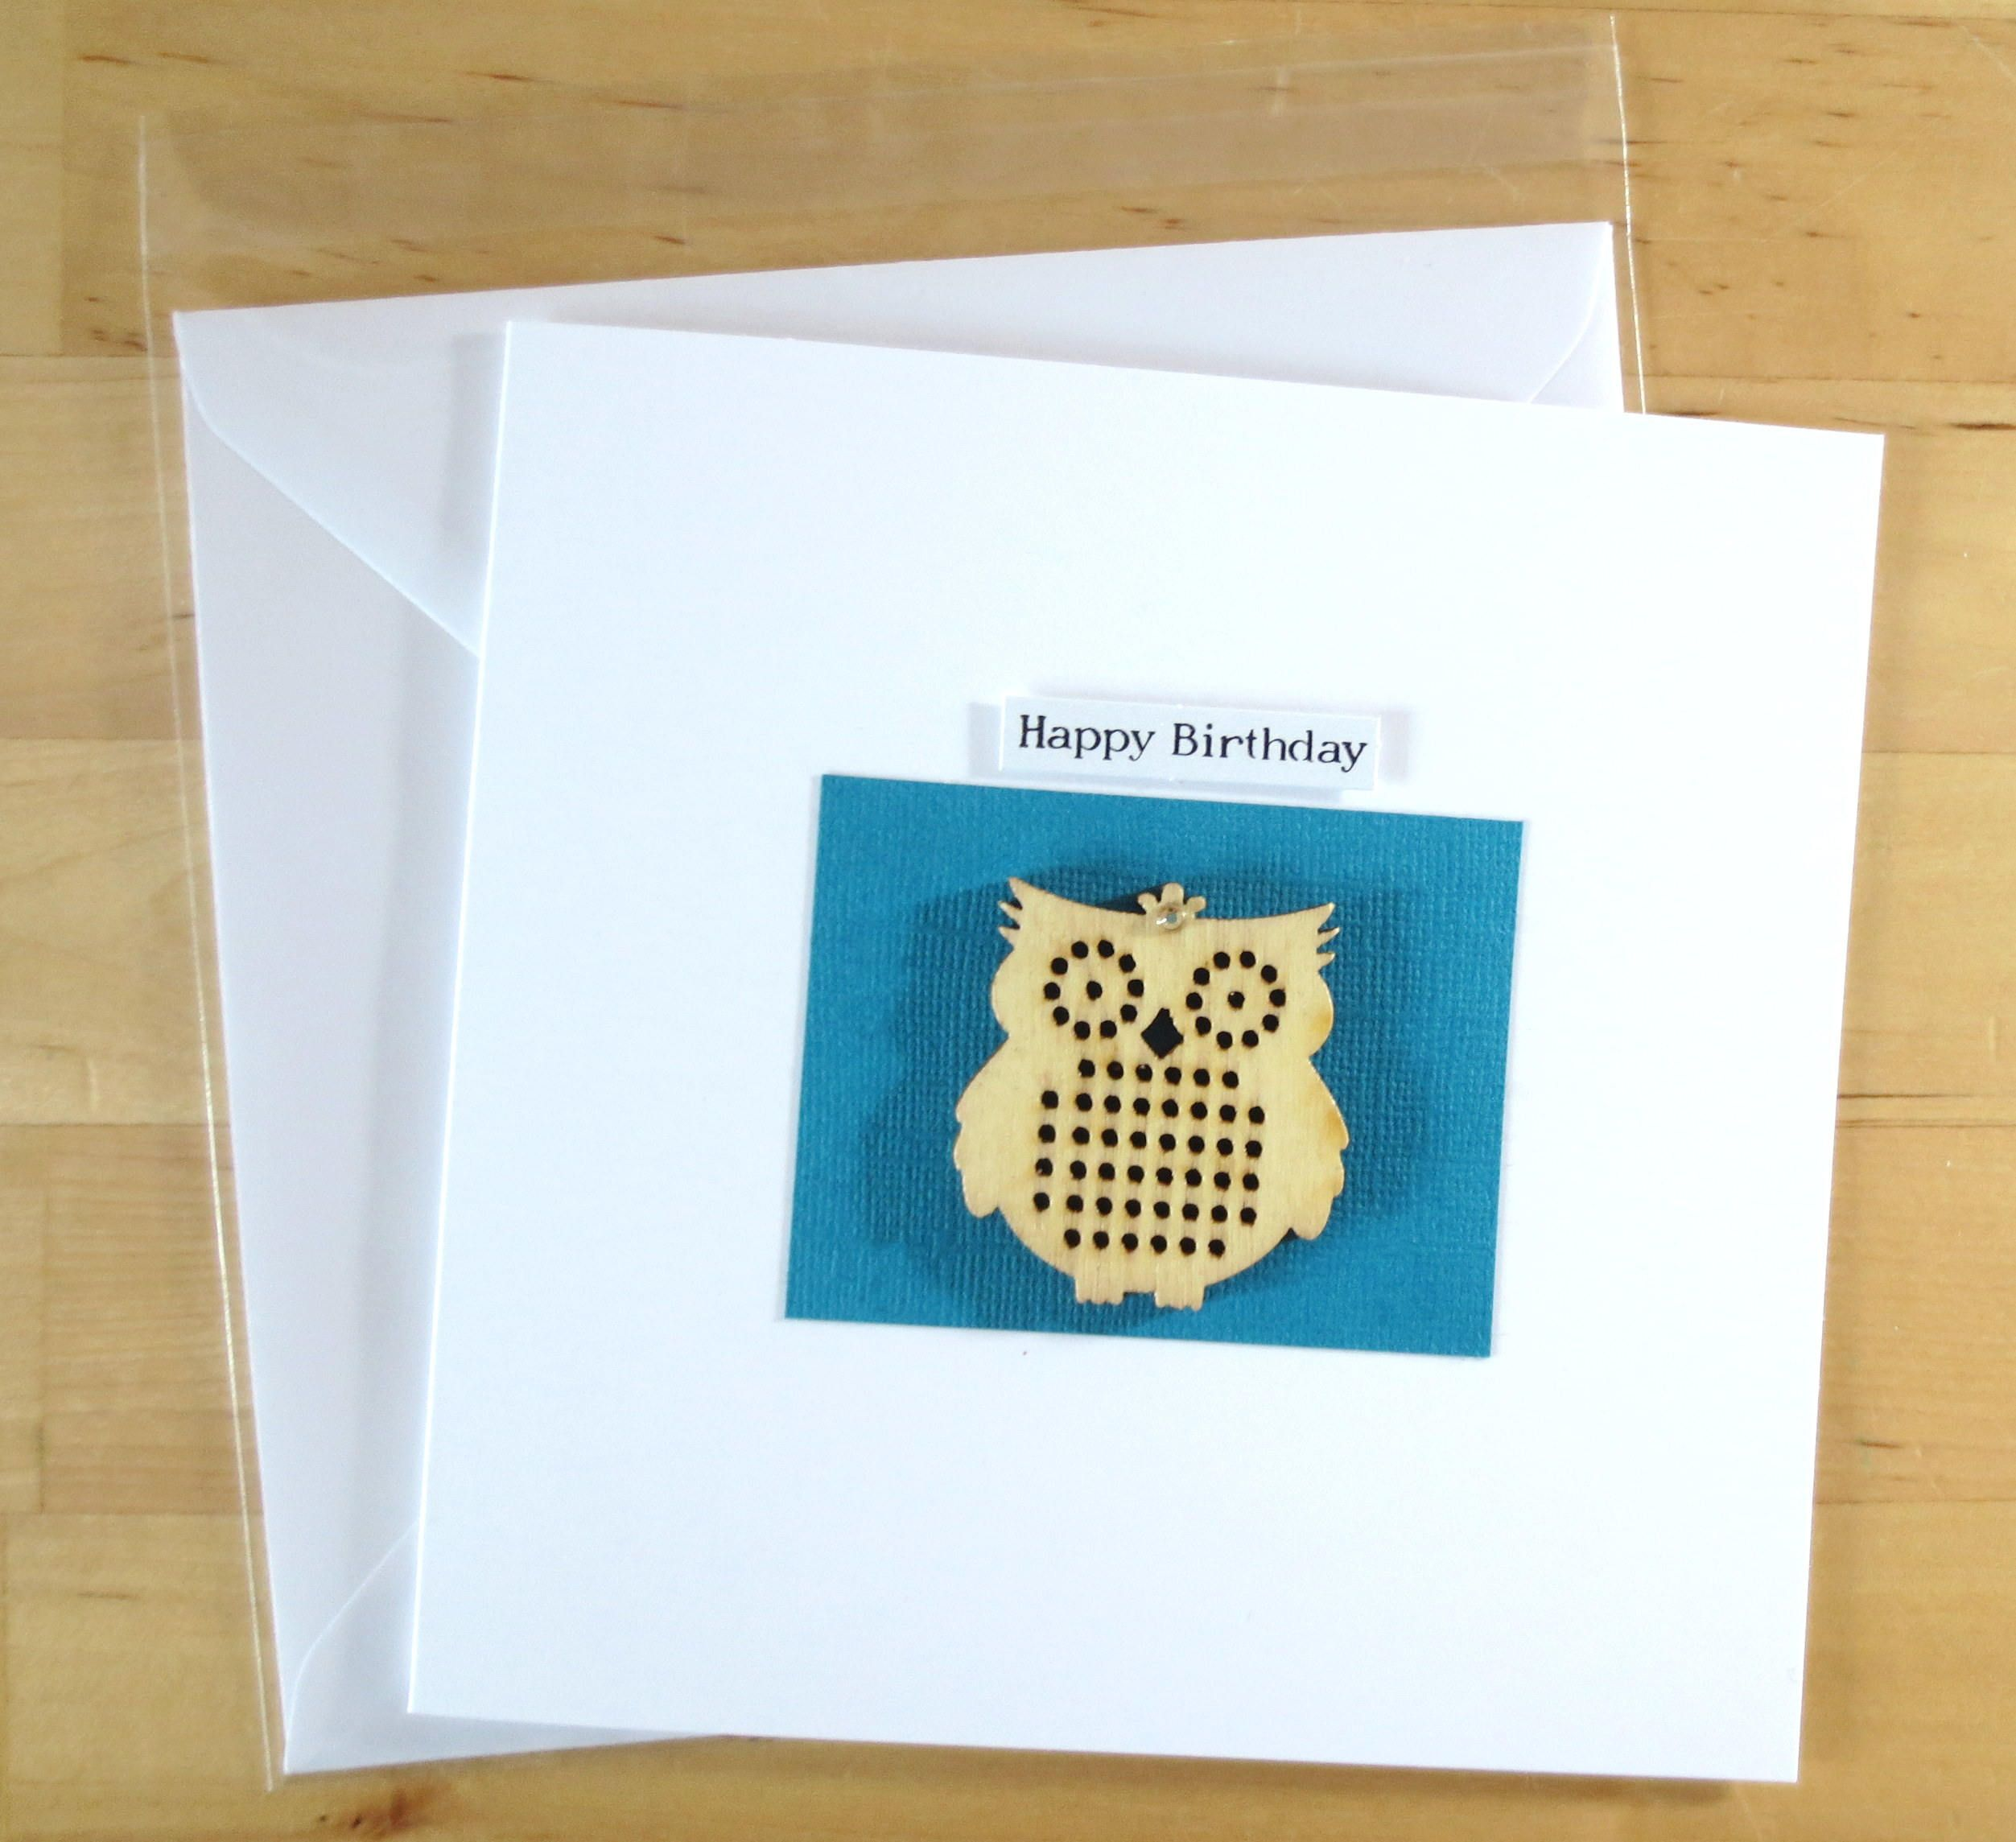 Birthday card owl owl cardowl card greeting card handmade birthday card owl owl cardowl card greeting card handmade birthday card bookmarktalkfo Images